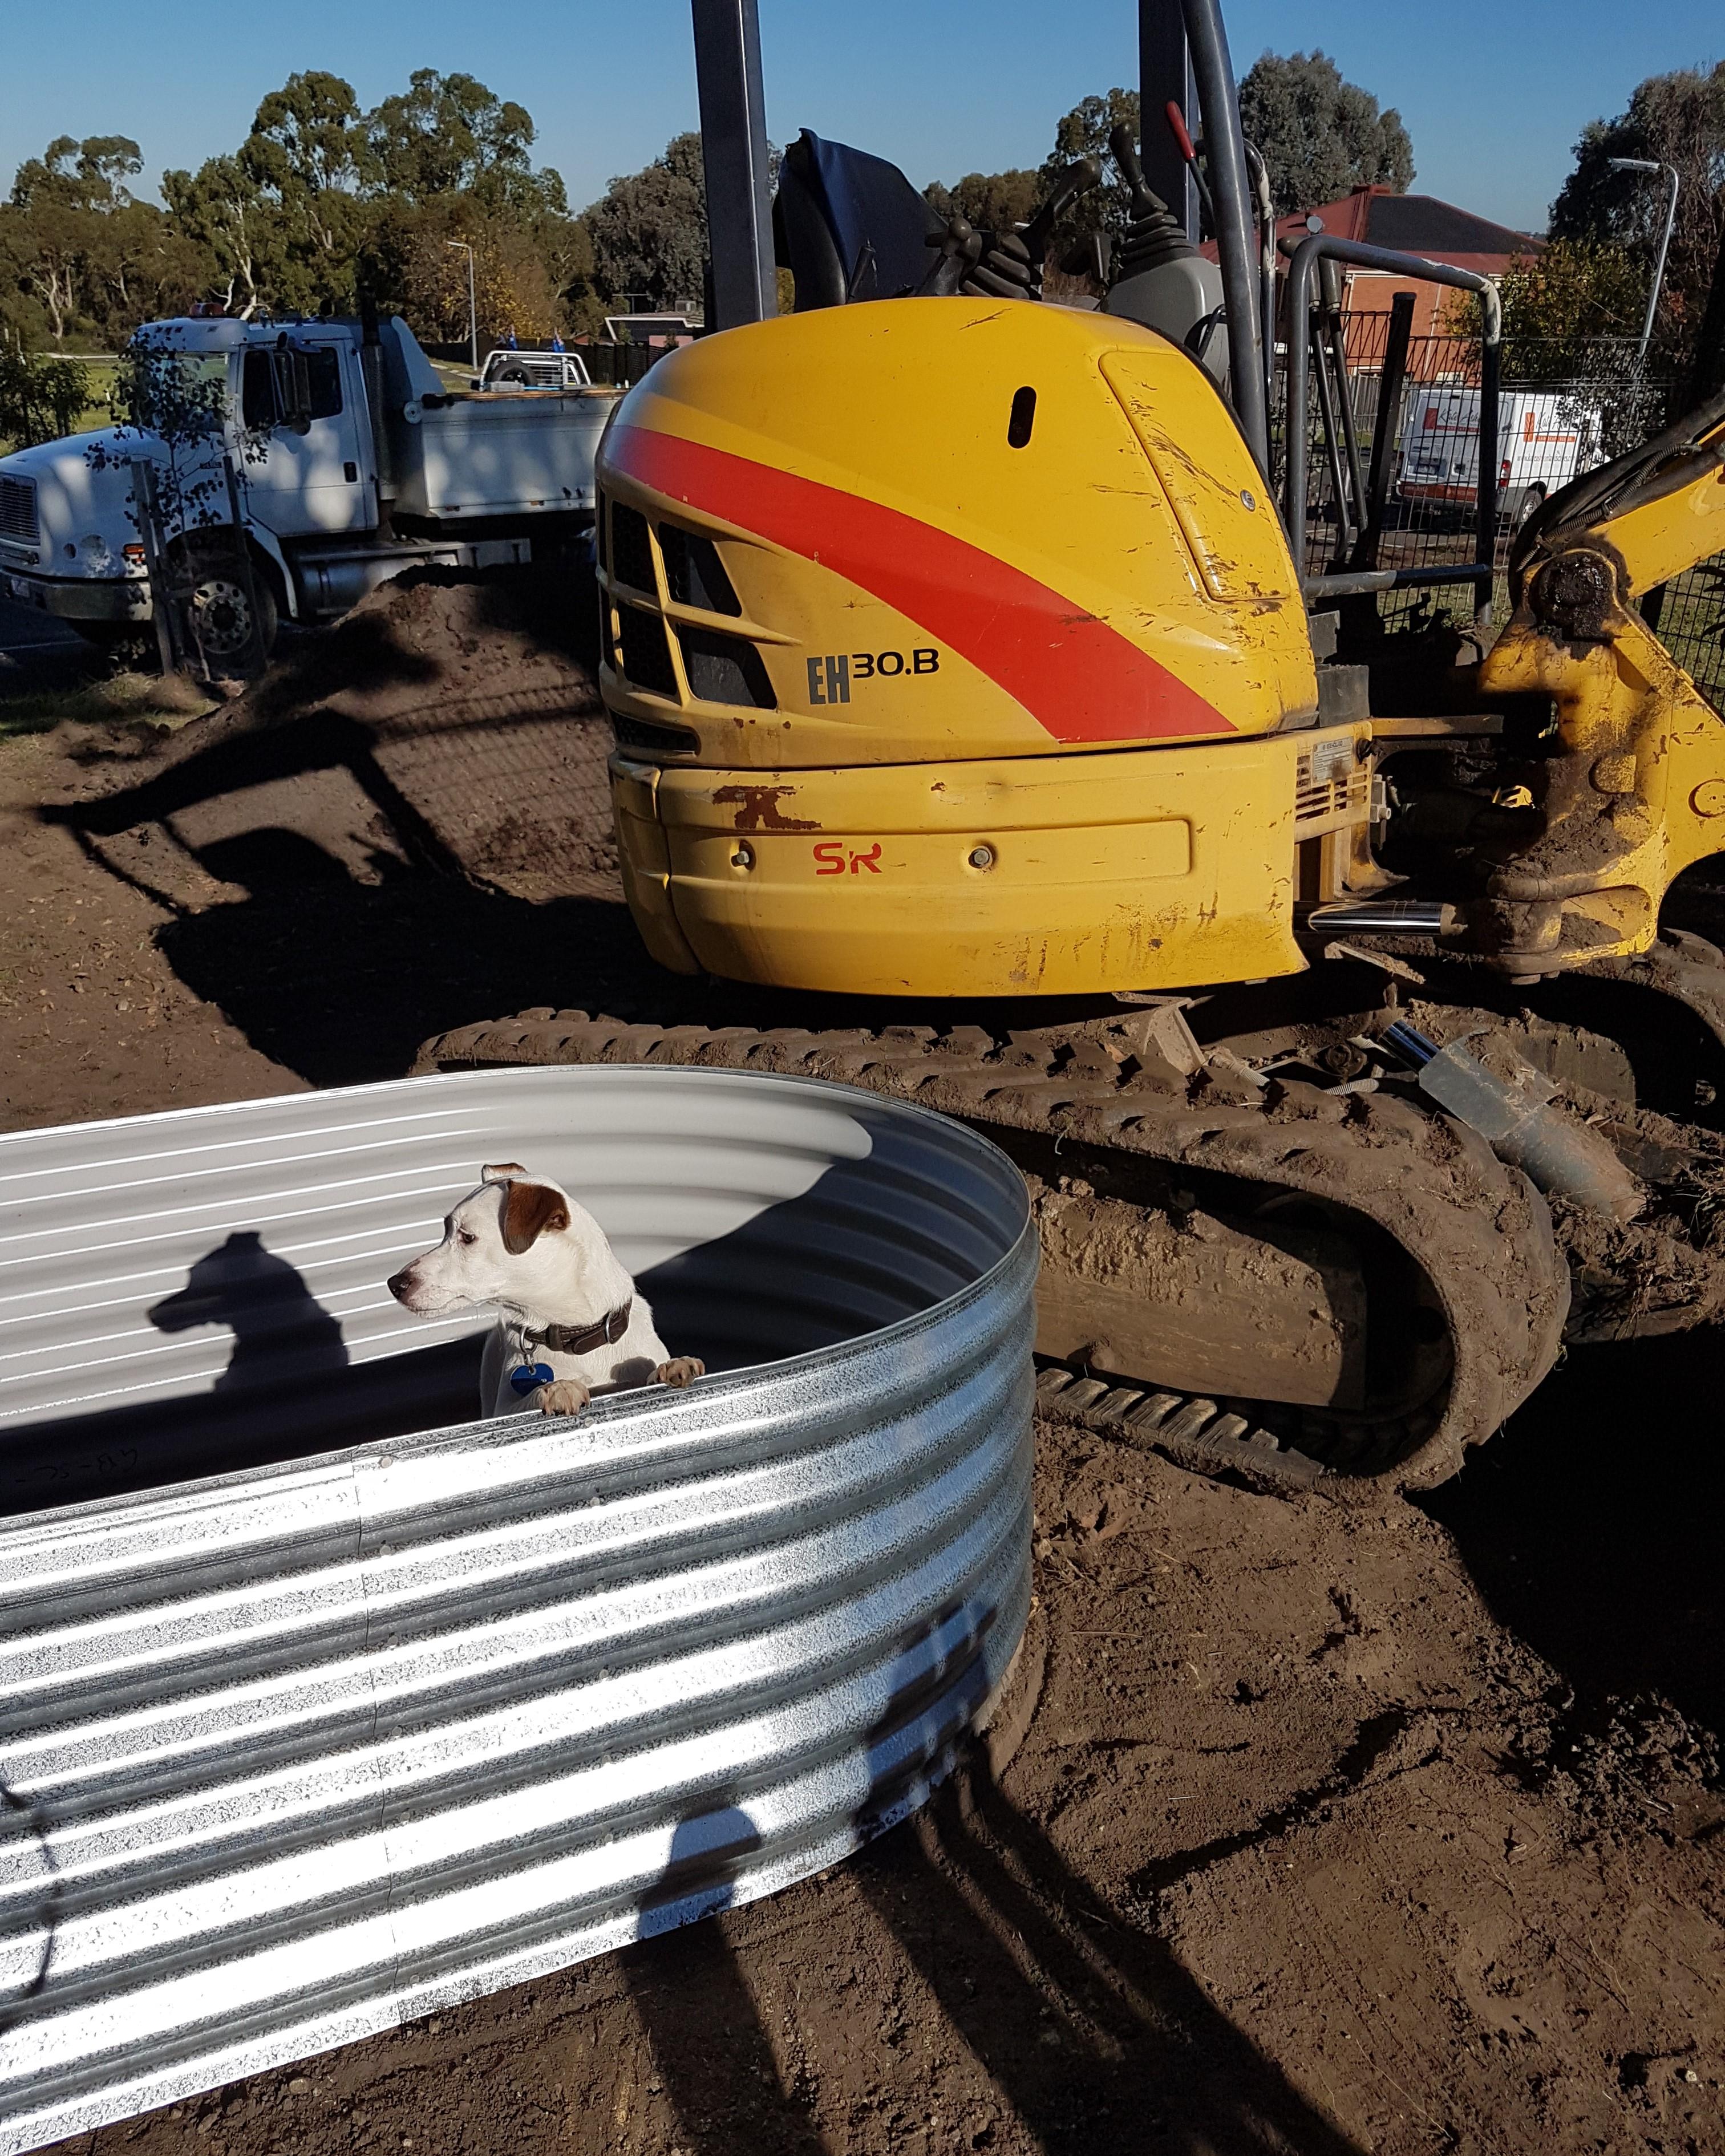 excurvator, dog, raised vegie bed, corigated iron vegie garden,